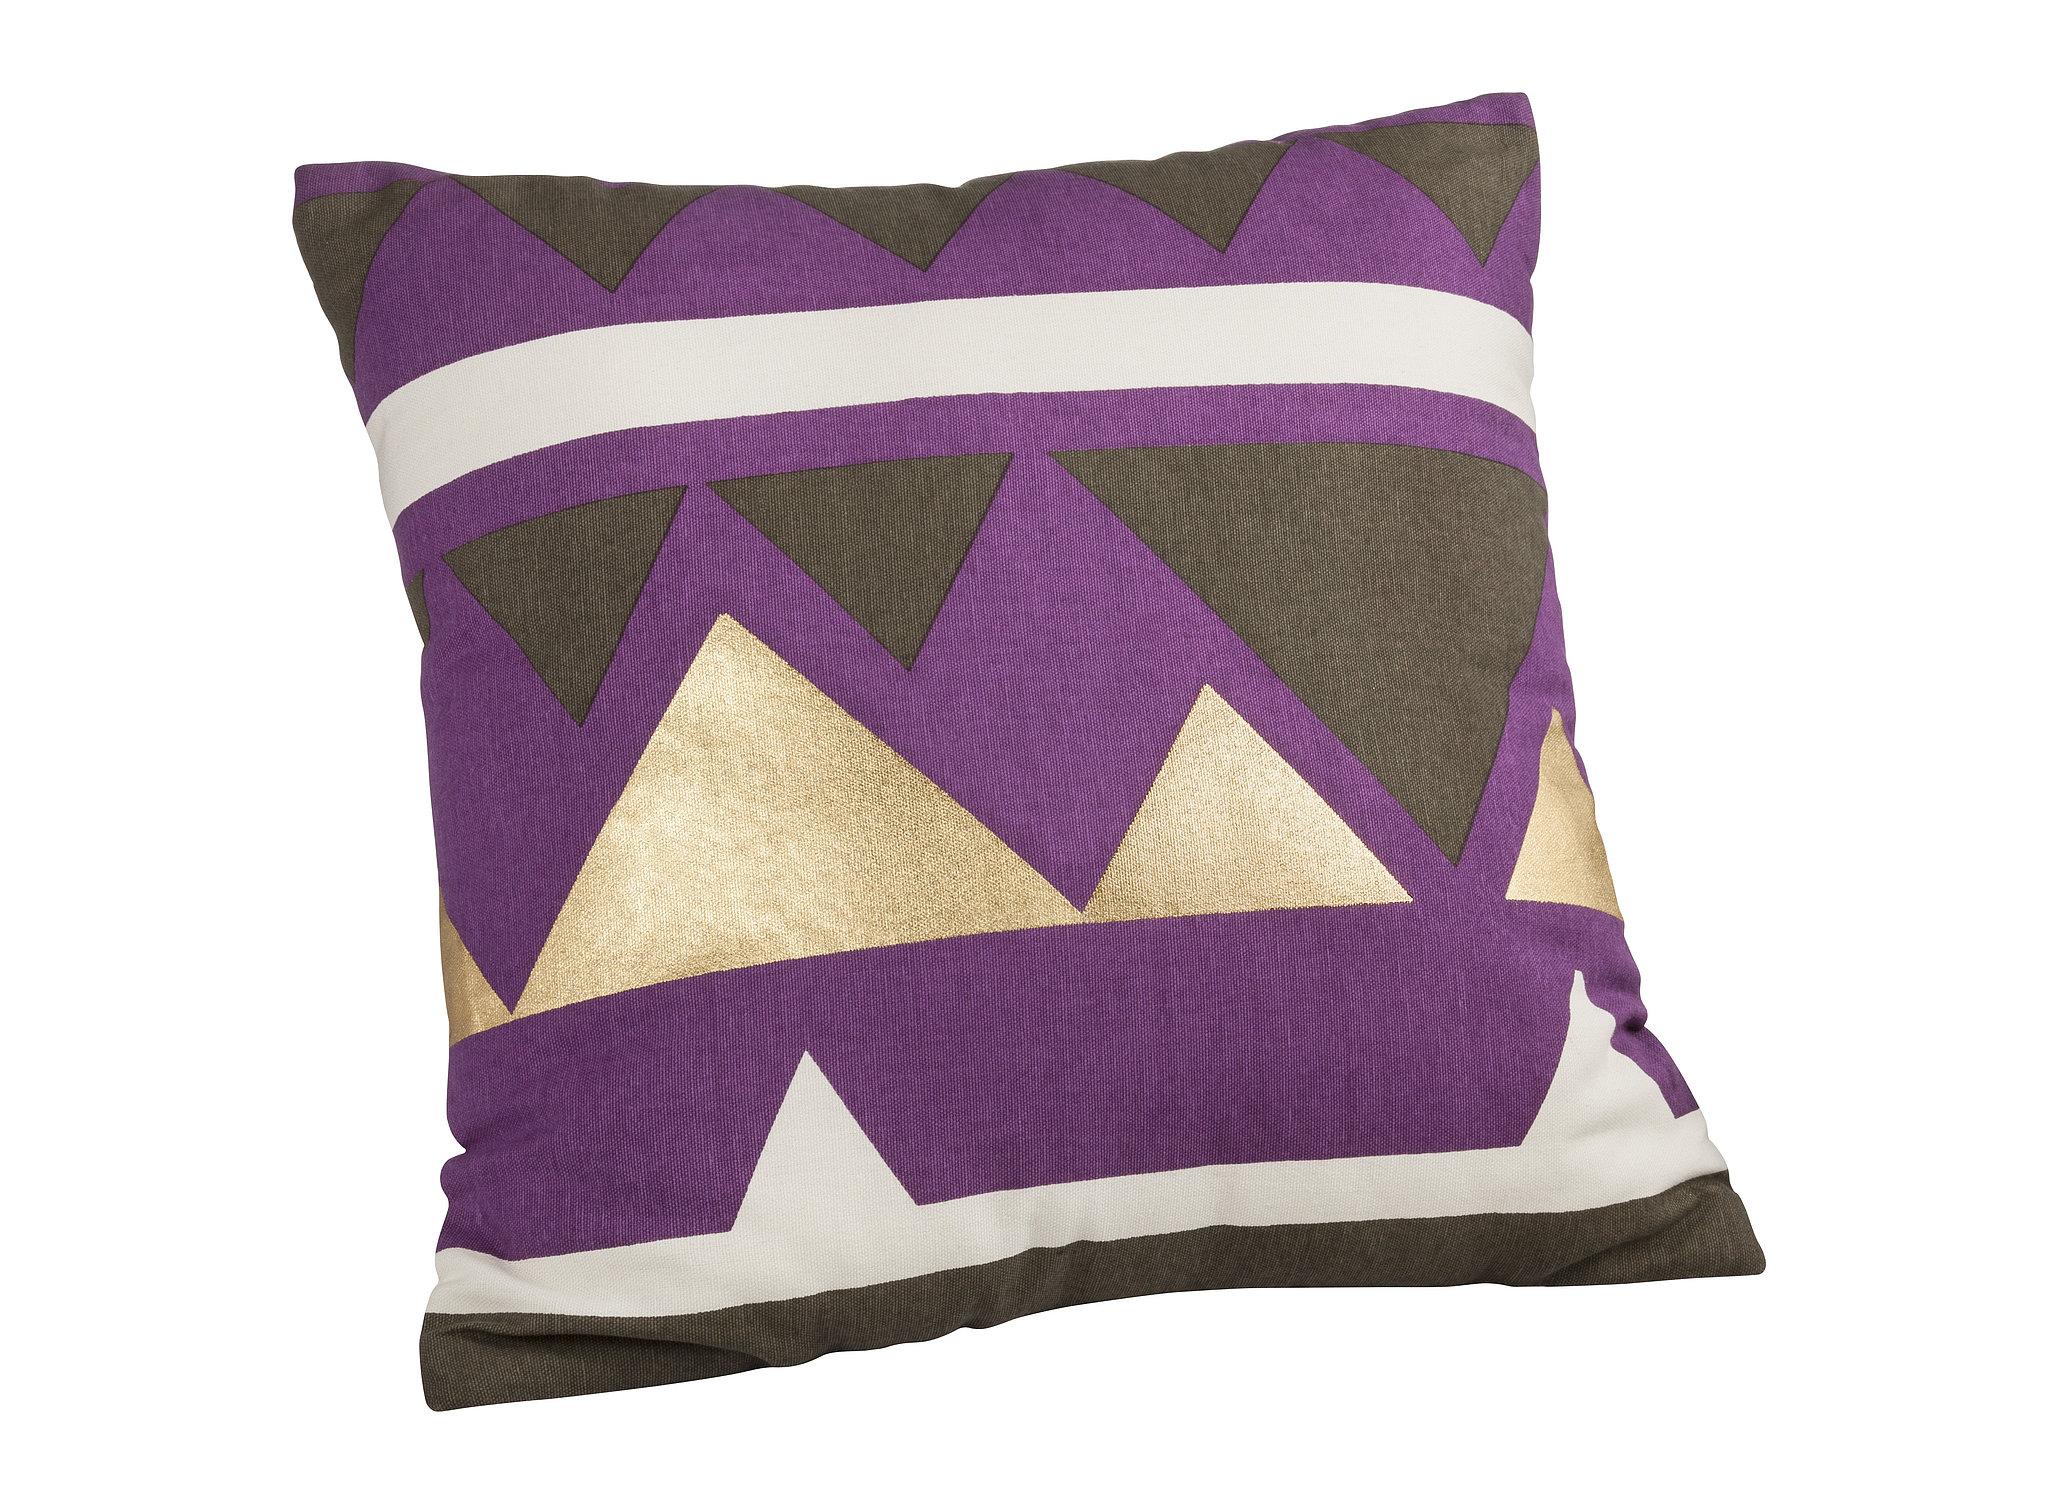 Metallic Accent Pillow ($25)